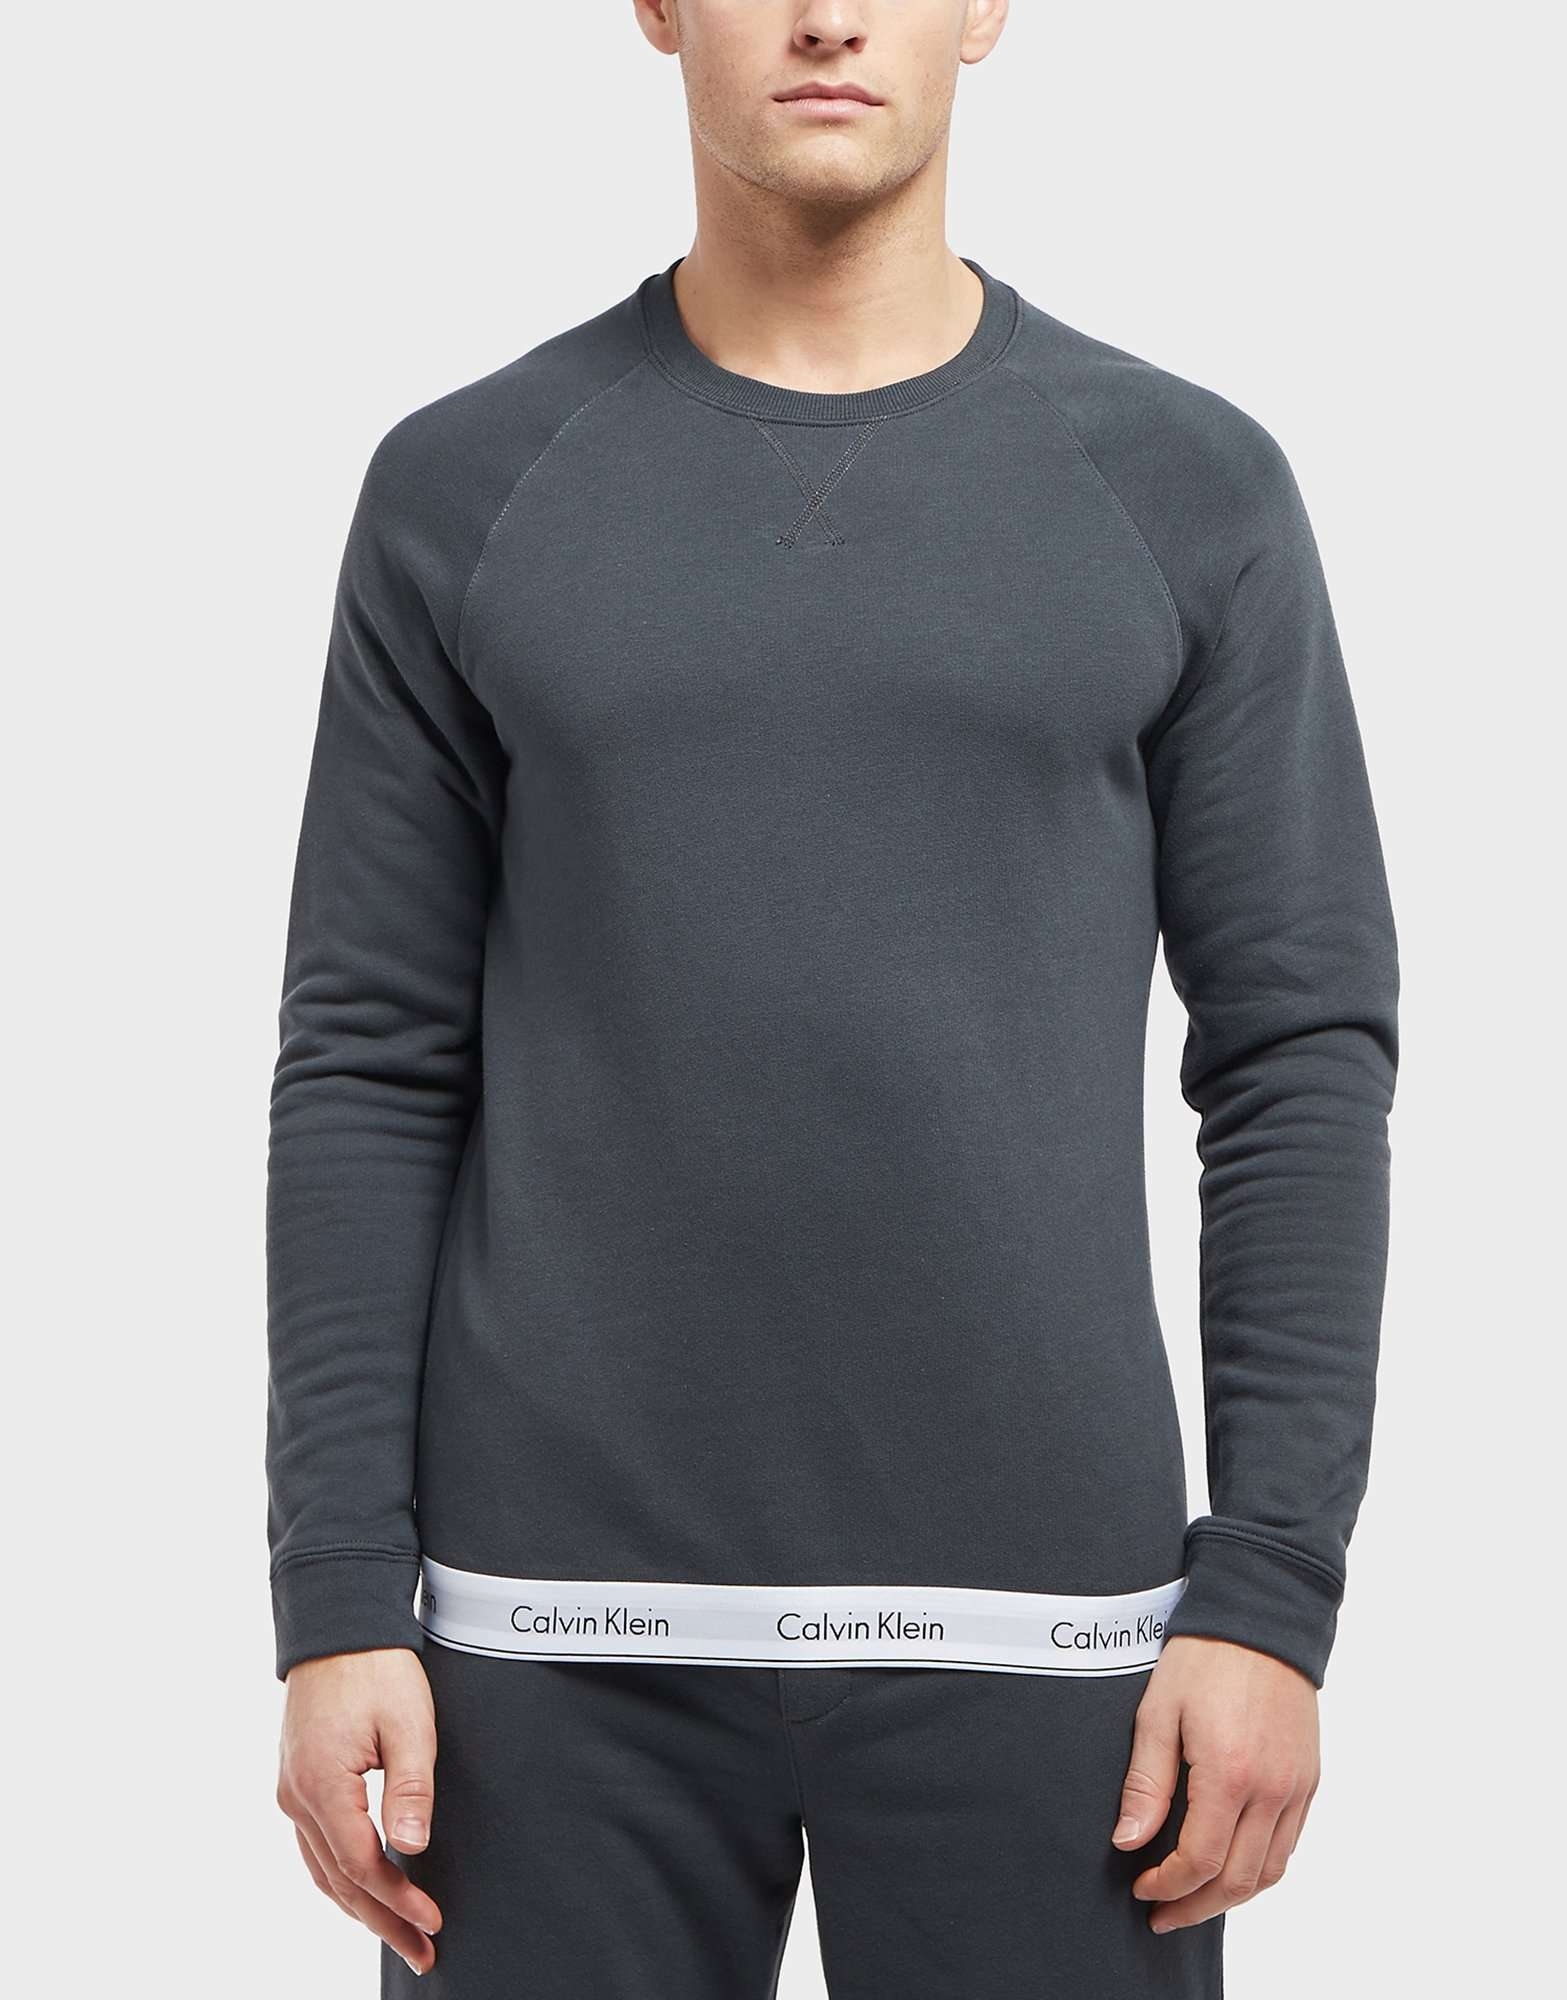 Calvin Klein Basic Crew Tape Sweatshirt